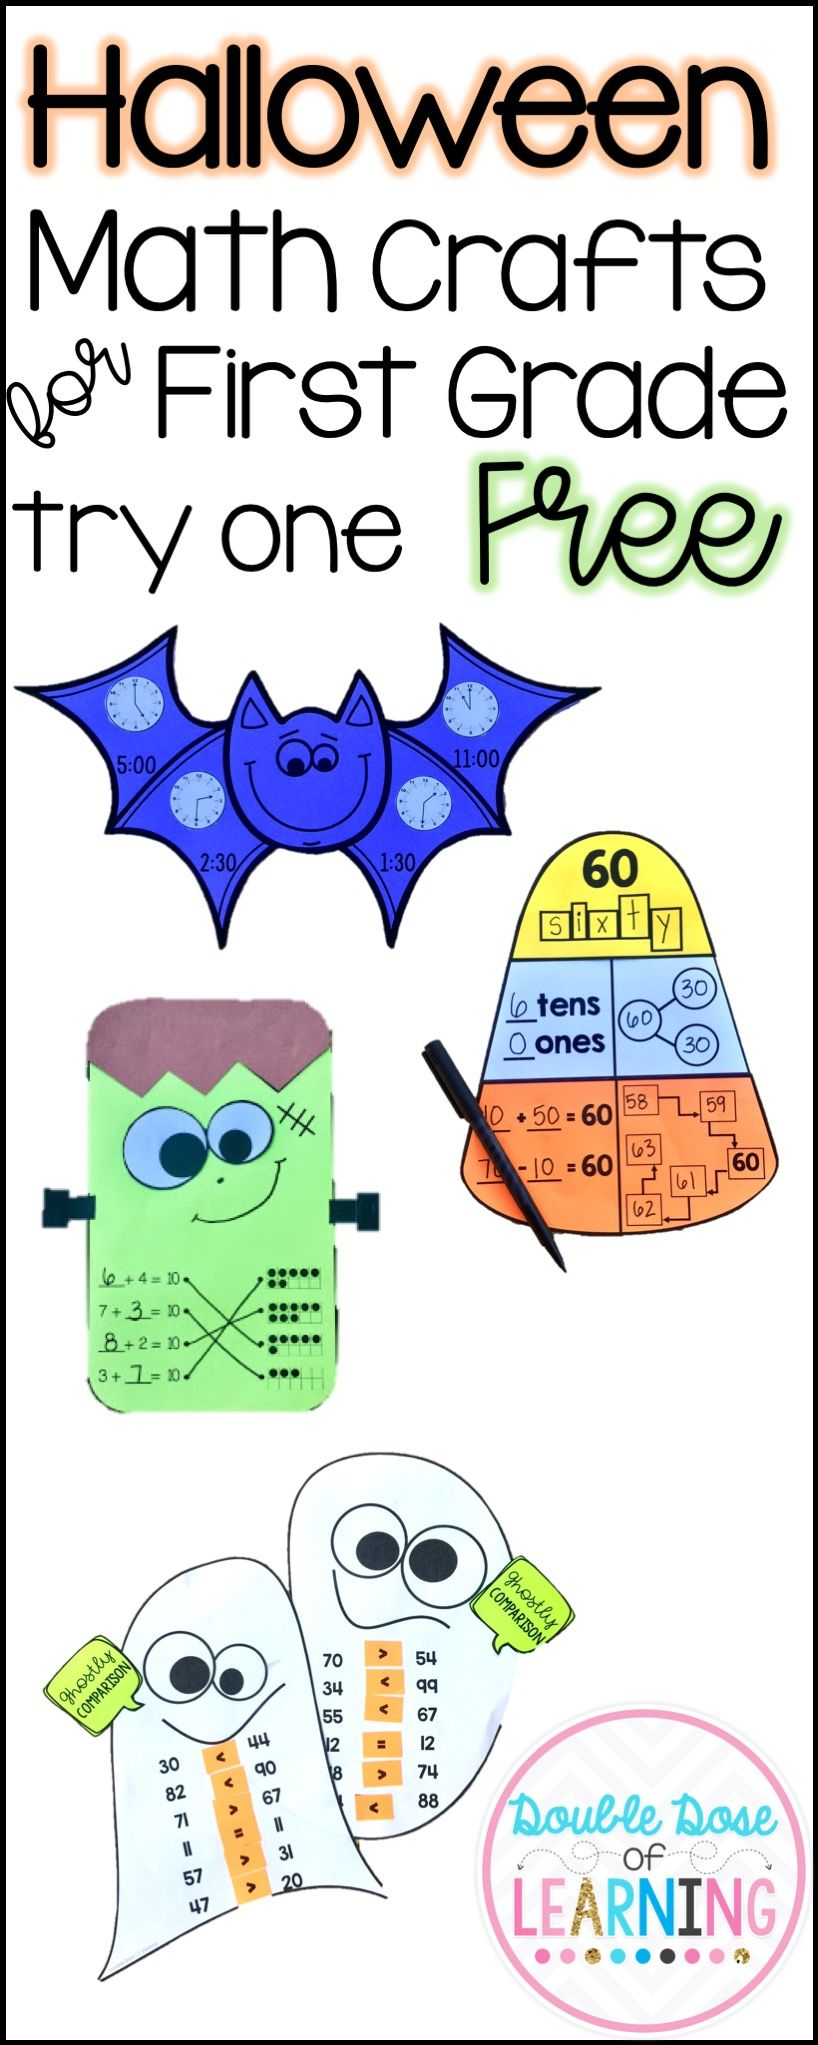 Halloween Math Crafts Halloween math crafts, Math crafts